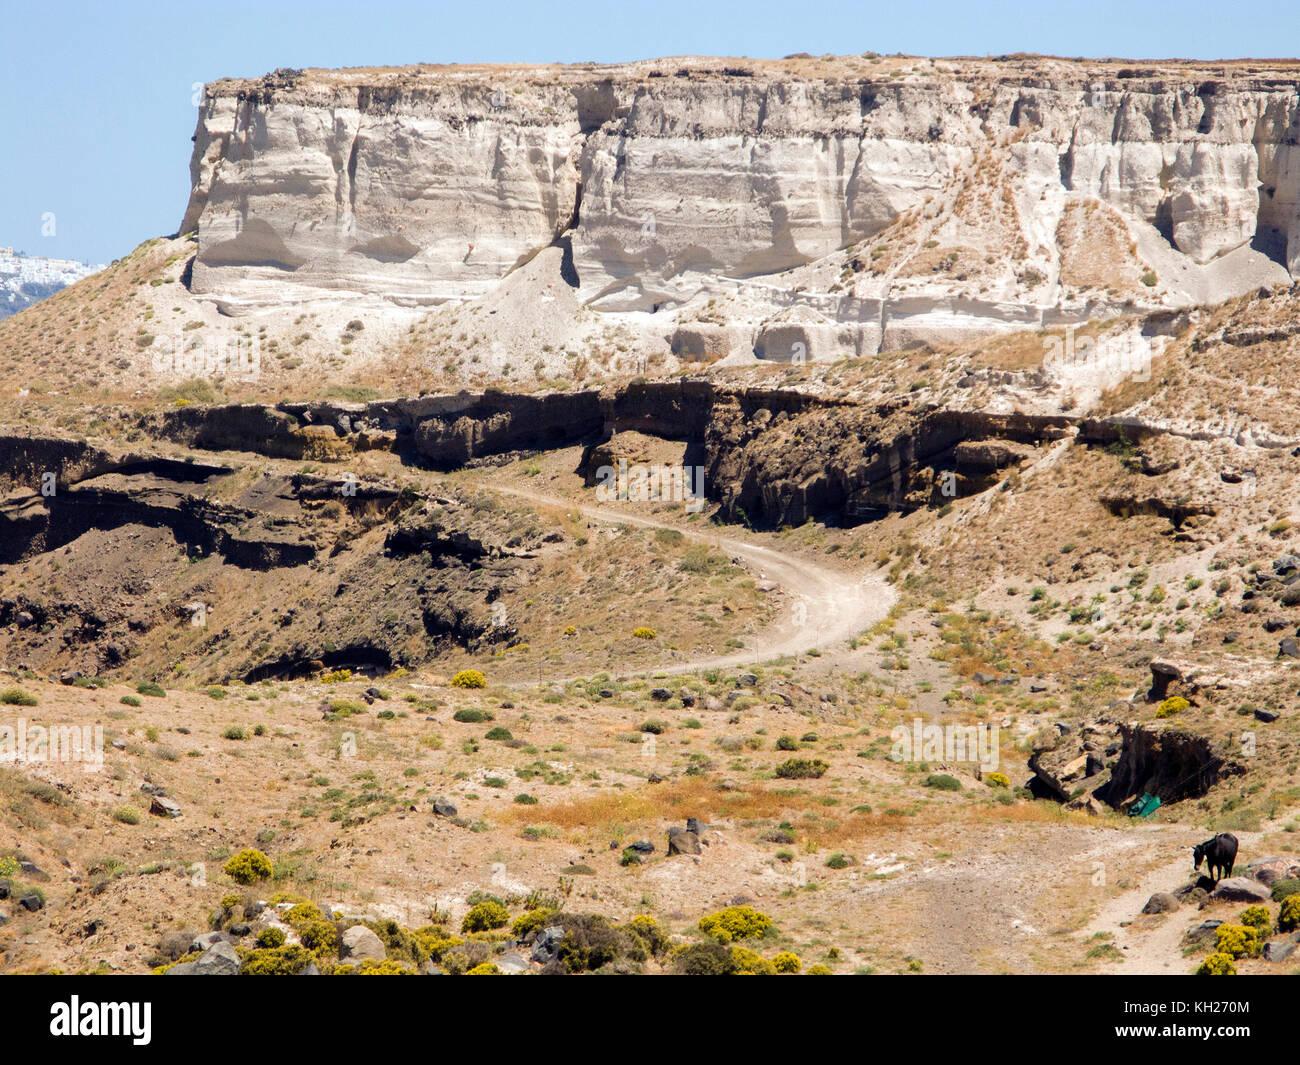 Pumice stone, rock at Akrotiri, Santorin island, Cyclades, Aegean, Greece - Stock Image